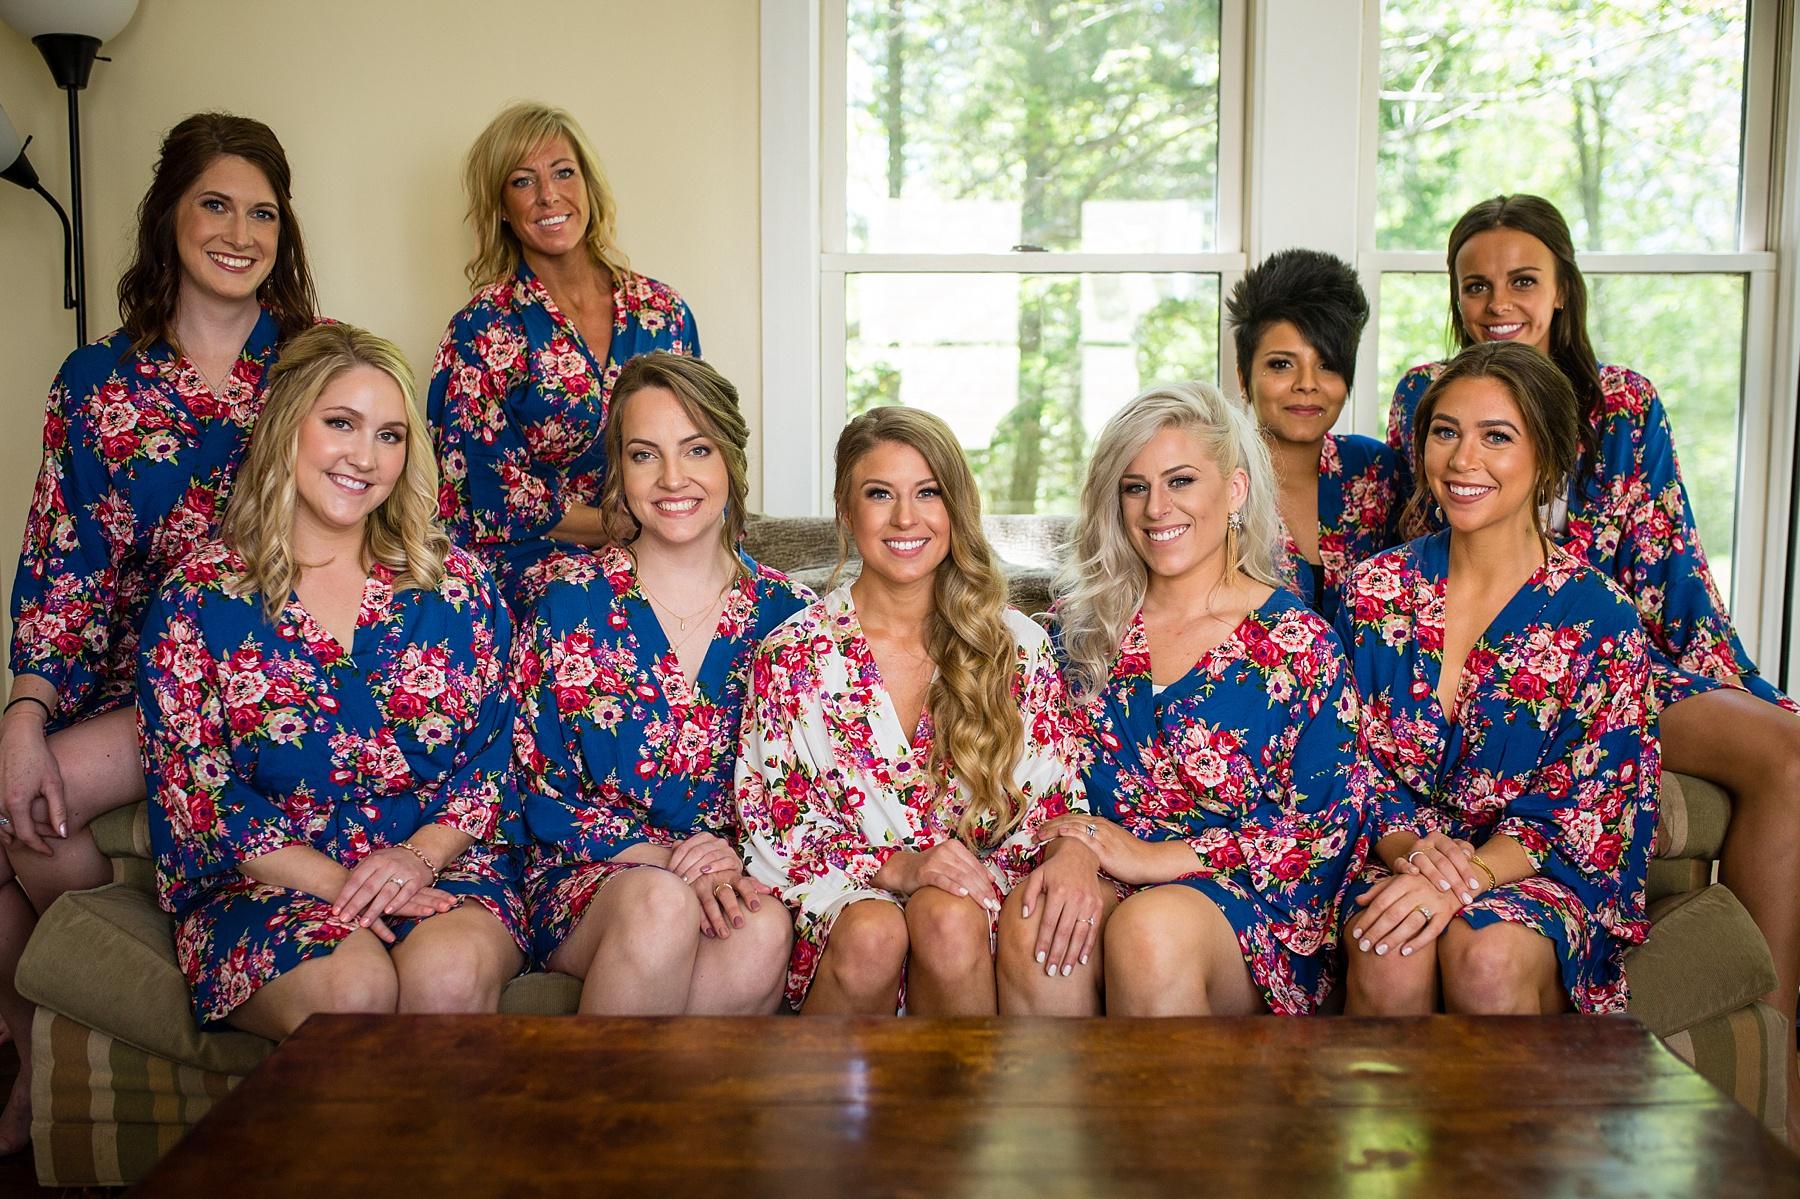 Brandon_Shafer_Photography_Kara_Doug_12_corners_Wedding_Benton_Harbor_0013.jpg